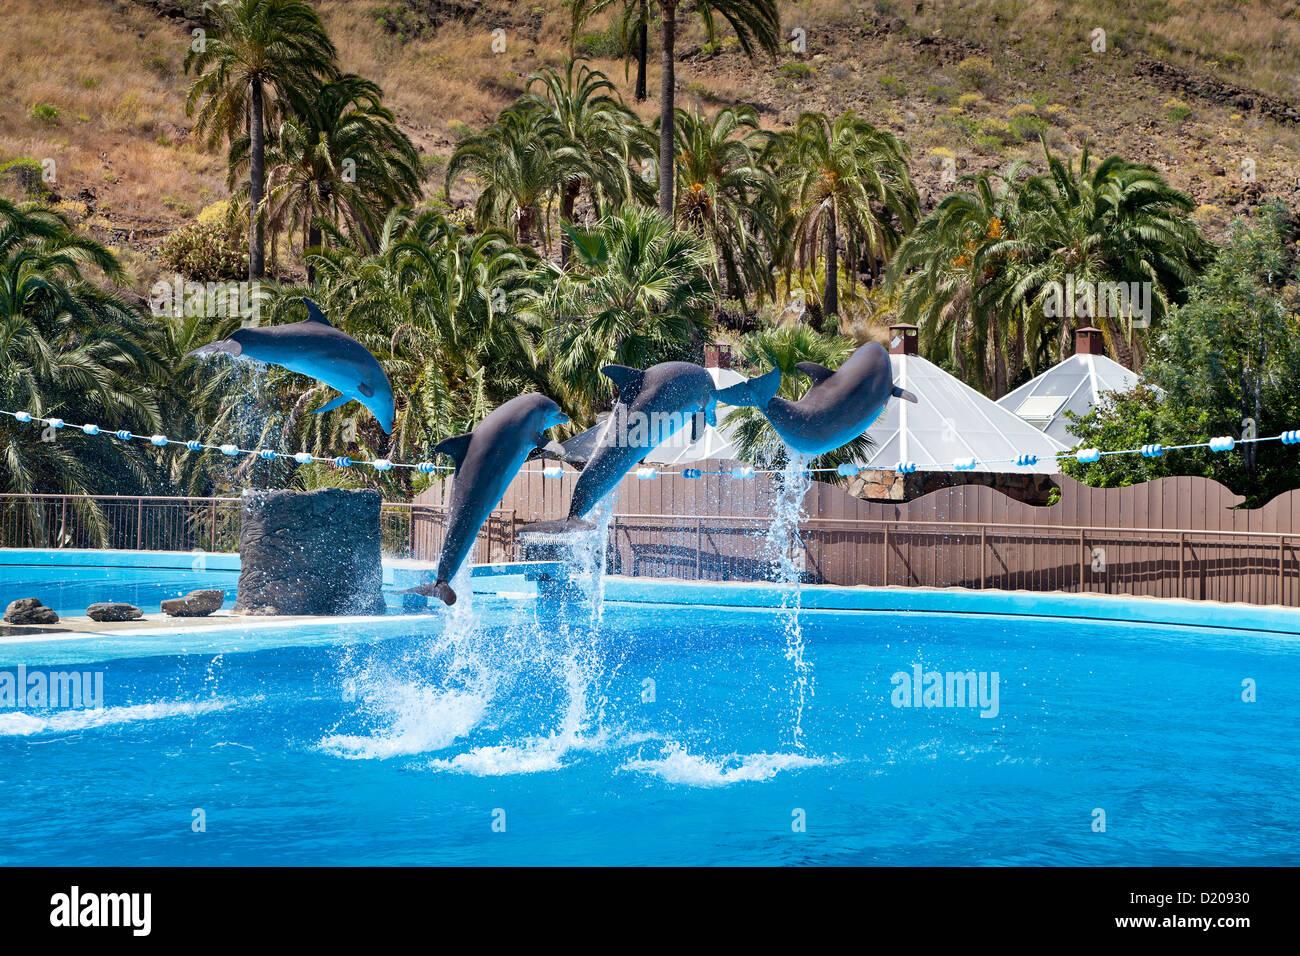 Delphin show im Palmitos Park, Maspalomas, Gran Canaria, Kanarische Inseln, Spanien, Europa Stockbild